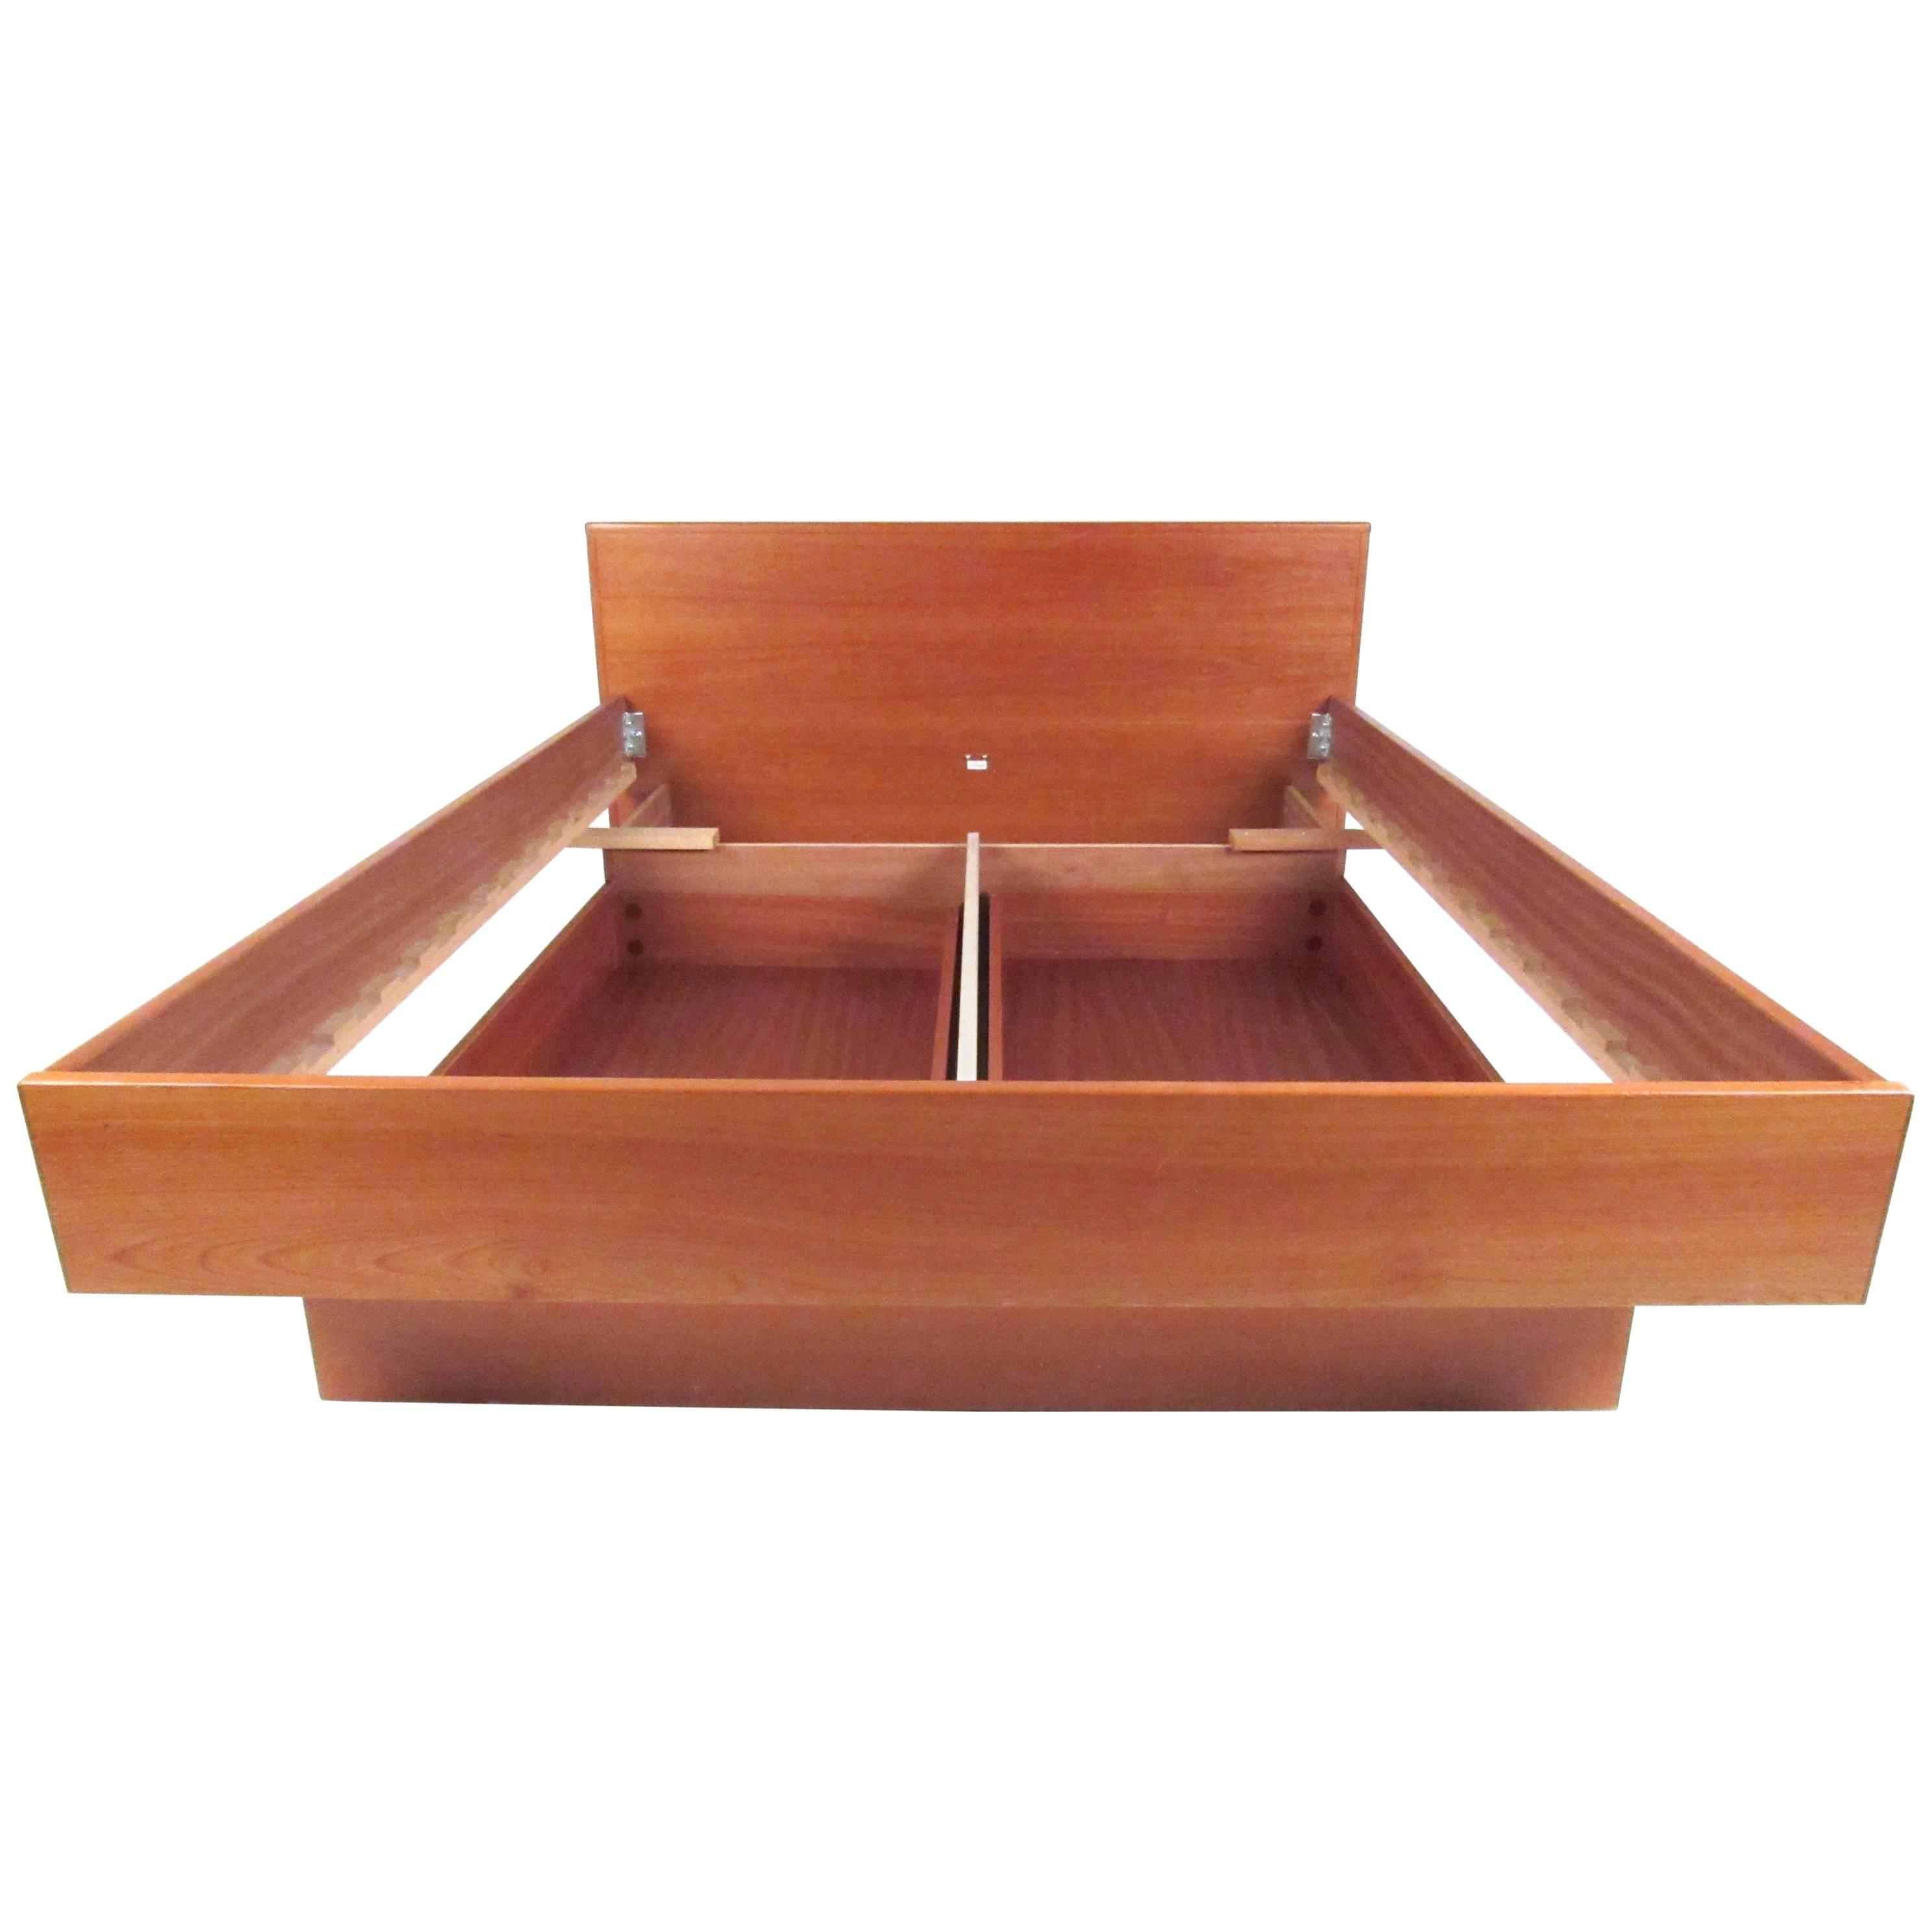 modern style teak platform bed with storage drawers